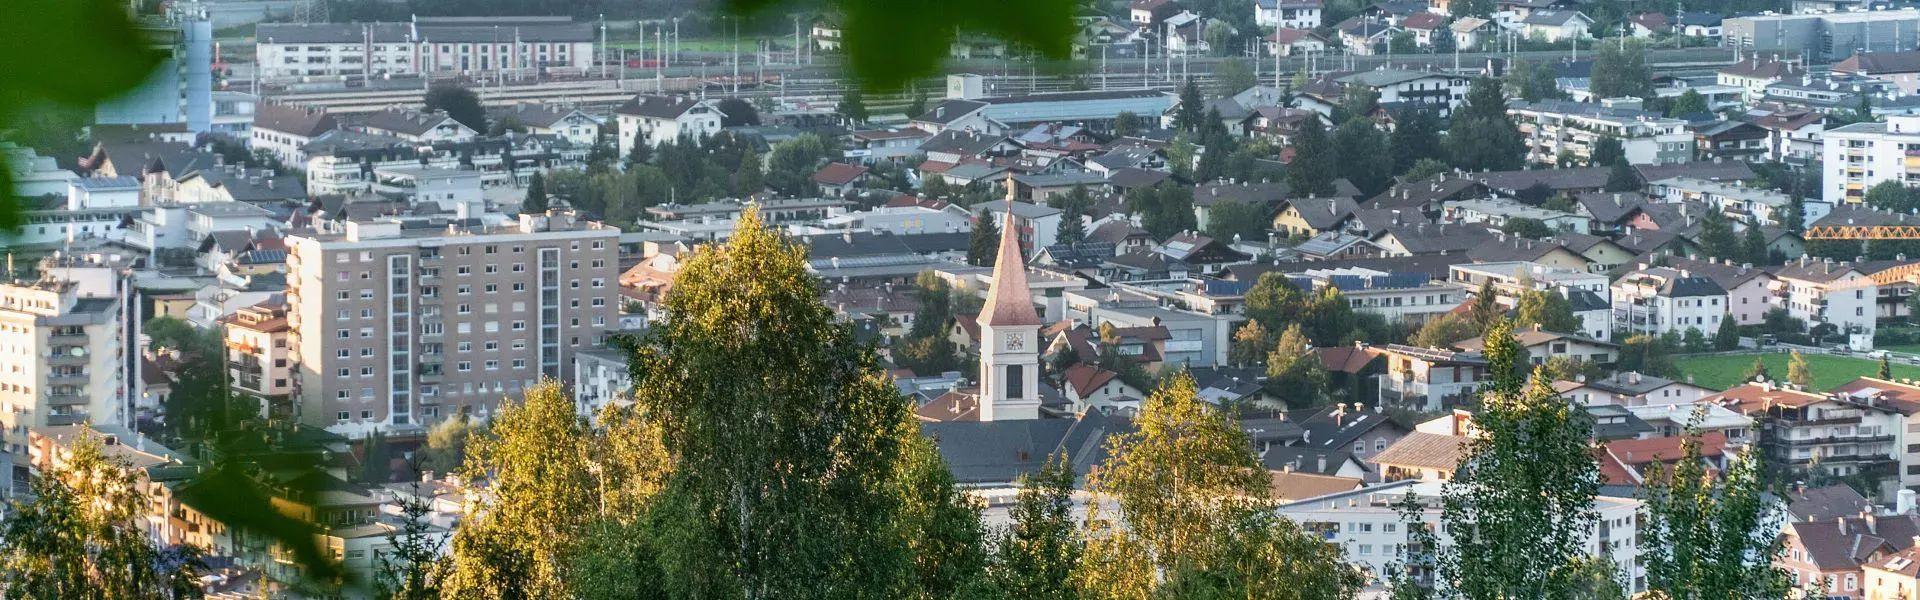 Perchtentreffen in Wrgl - in den Kitzbheler Alpen